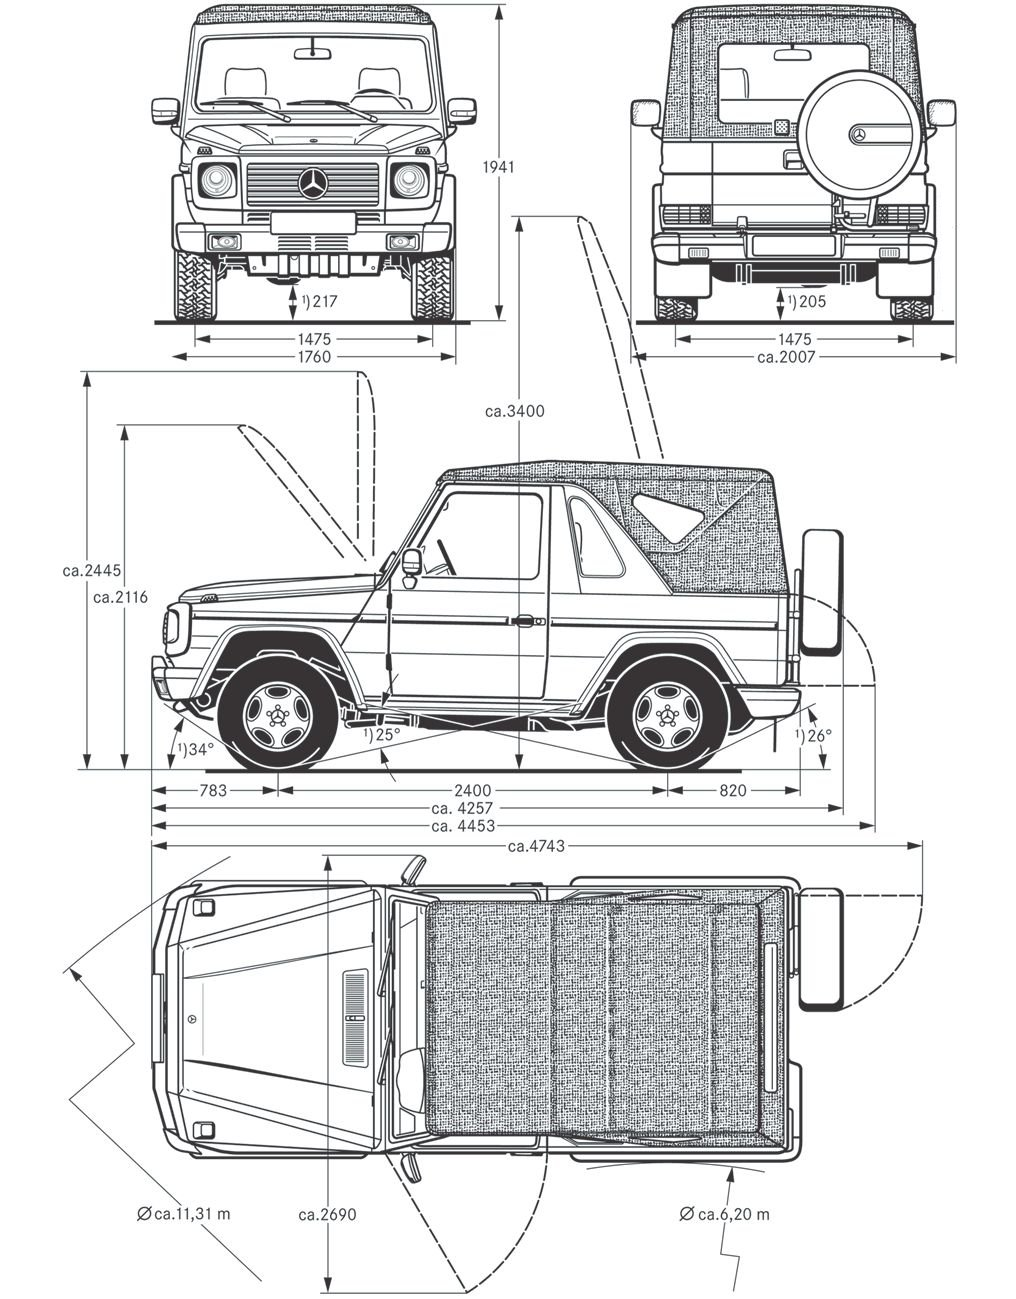 20-dimensions-exterieures-version-cabriolet-g320-cdi-mercedes-classe-g-463.jpg